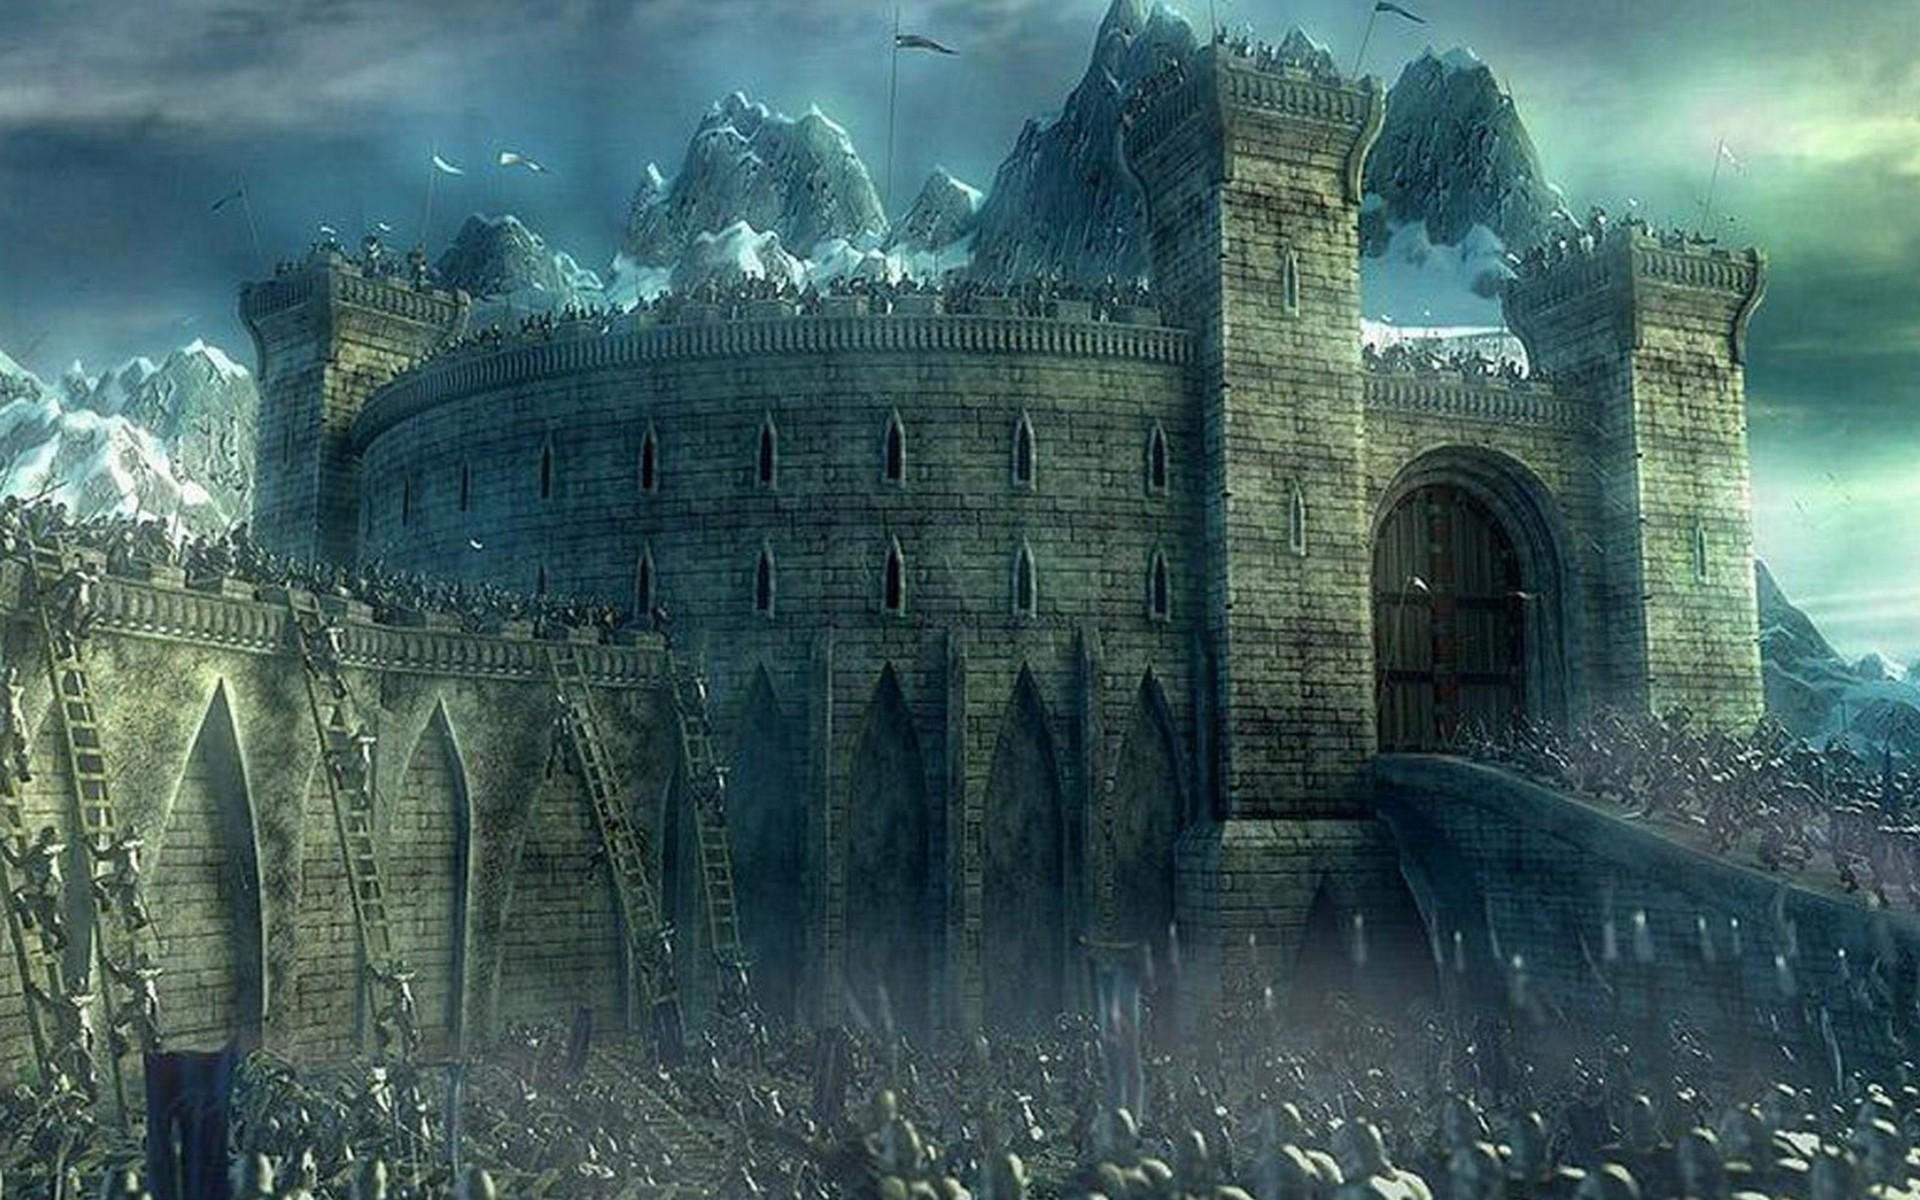 Castles fantasy art battles artwork low resolution helms deep ...